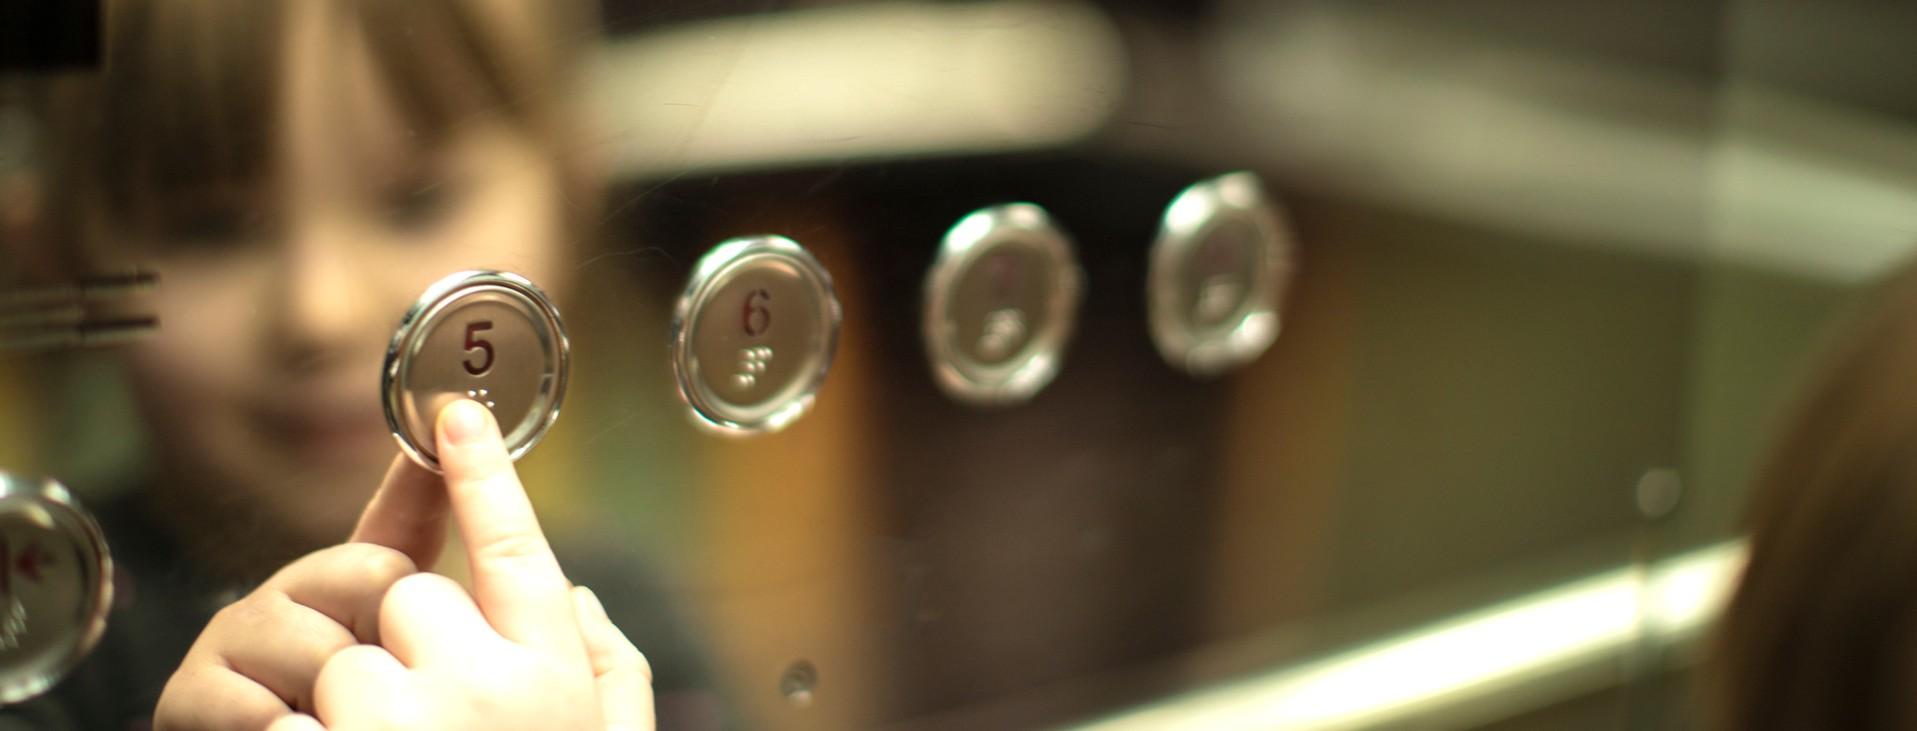 PFB Immagine Header Componenti Meccanici per Ascensori